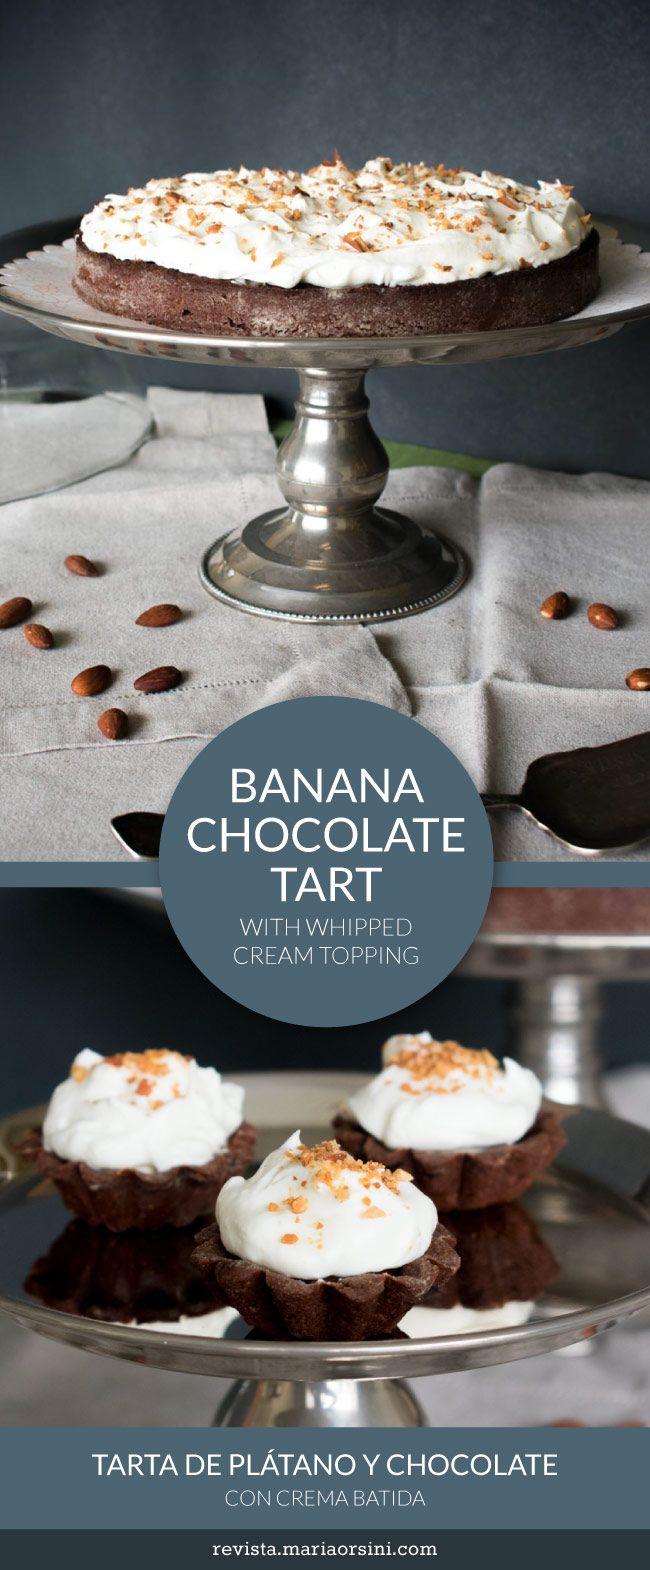 Banana chocolate tart, with whipped cream and almonds - tarta de chocolate y plátano, con crema batida y almendras.